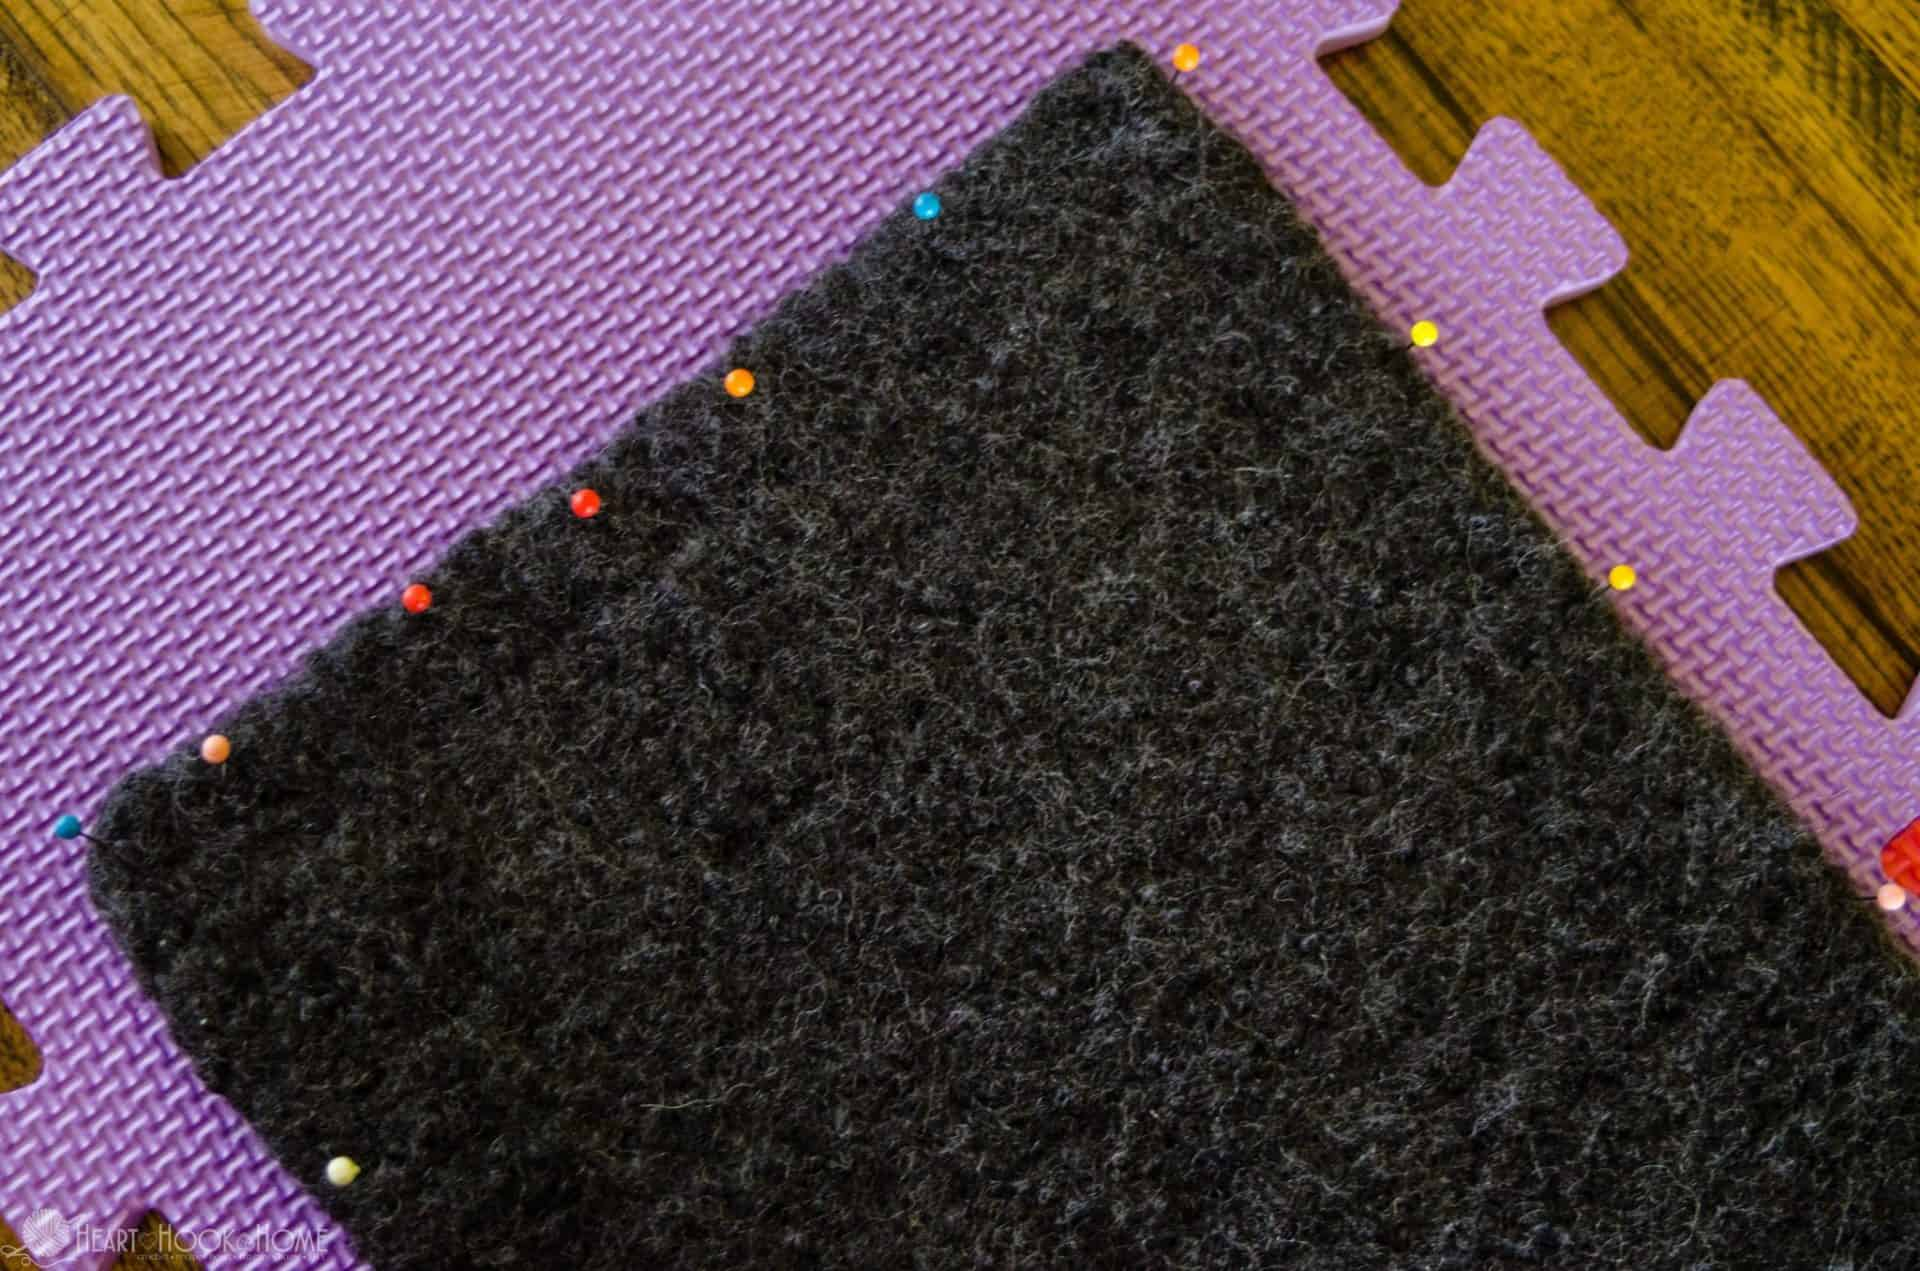 Knitting Needle Case Pattern To Sew